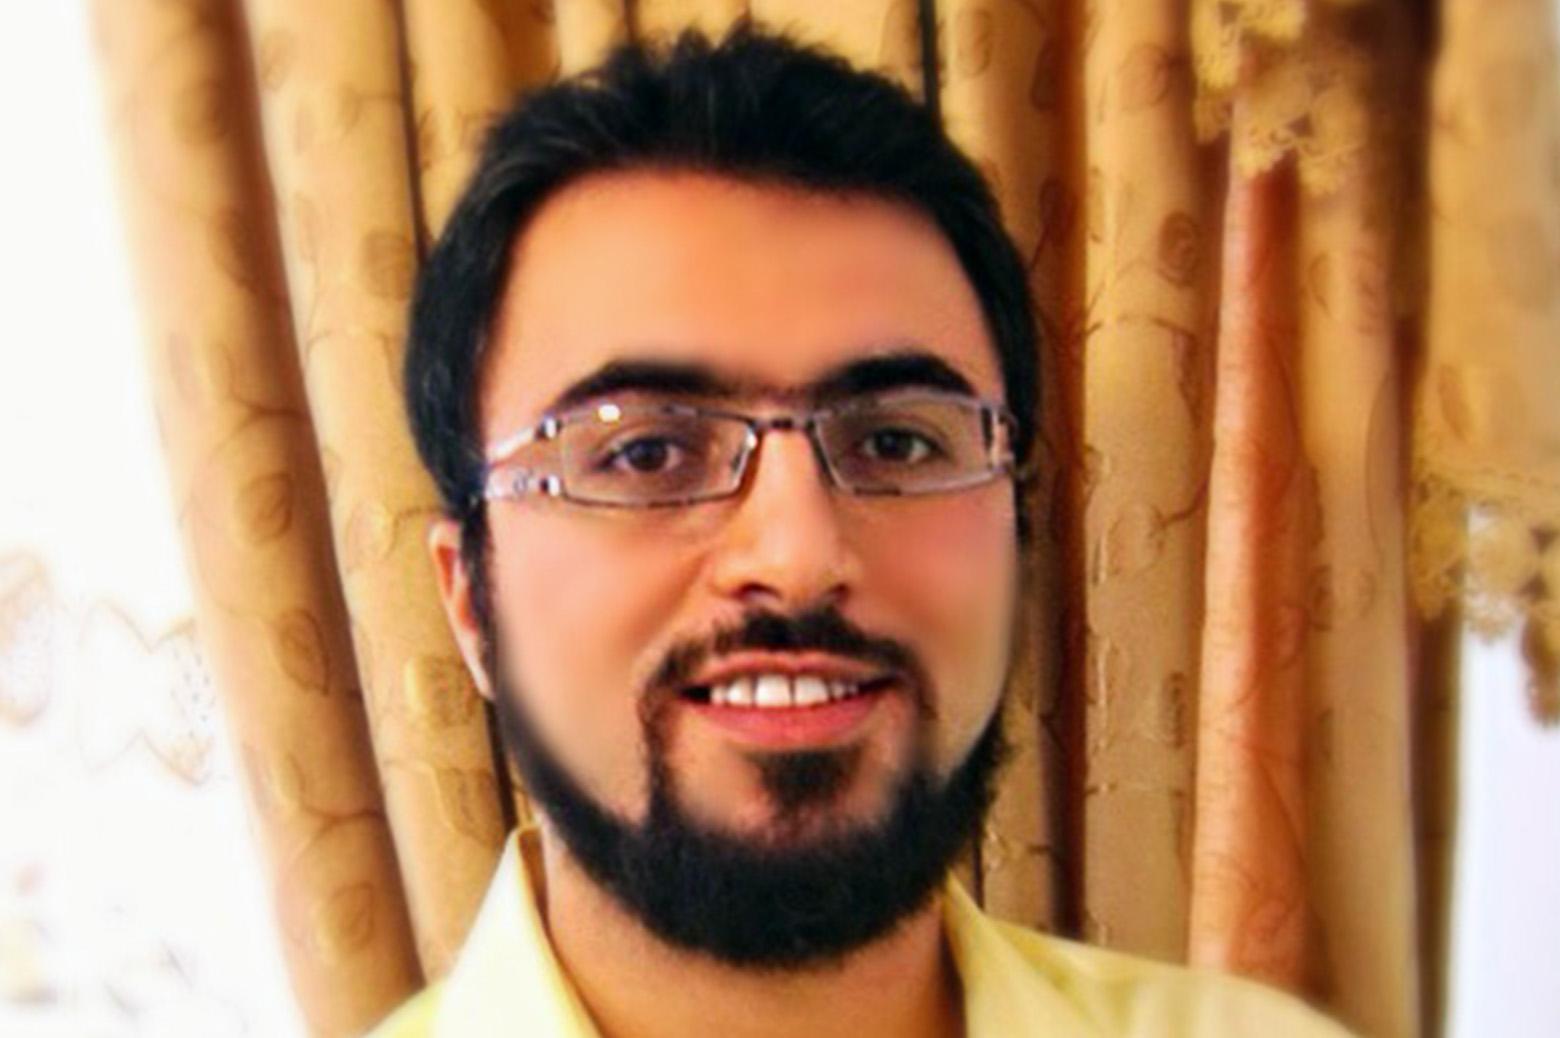 Prof. Barzan Mozafari